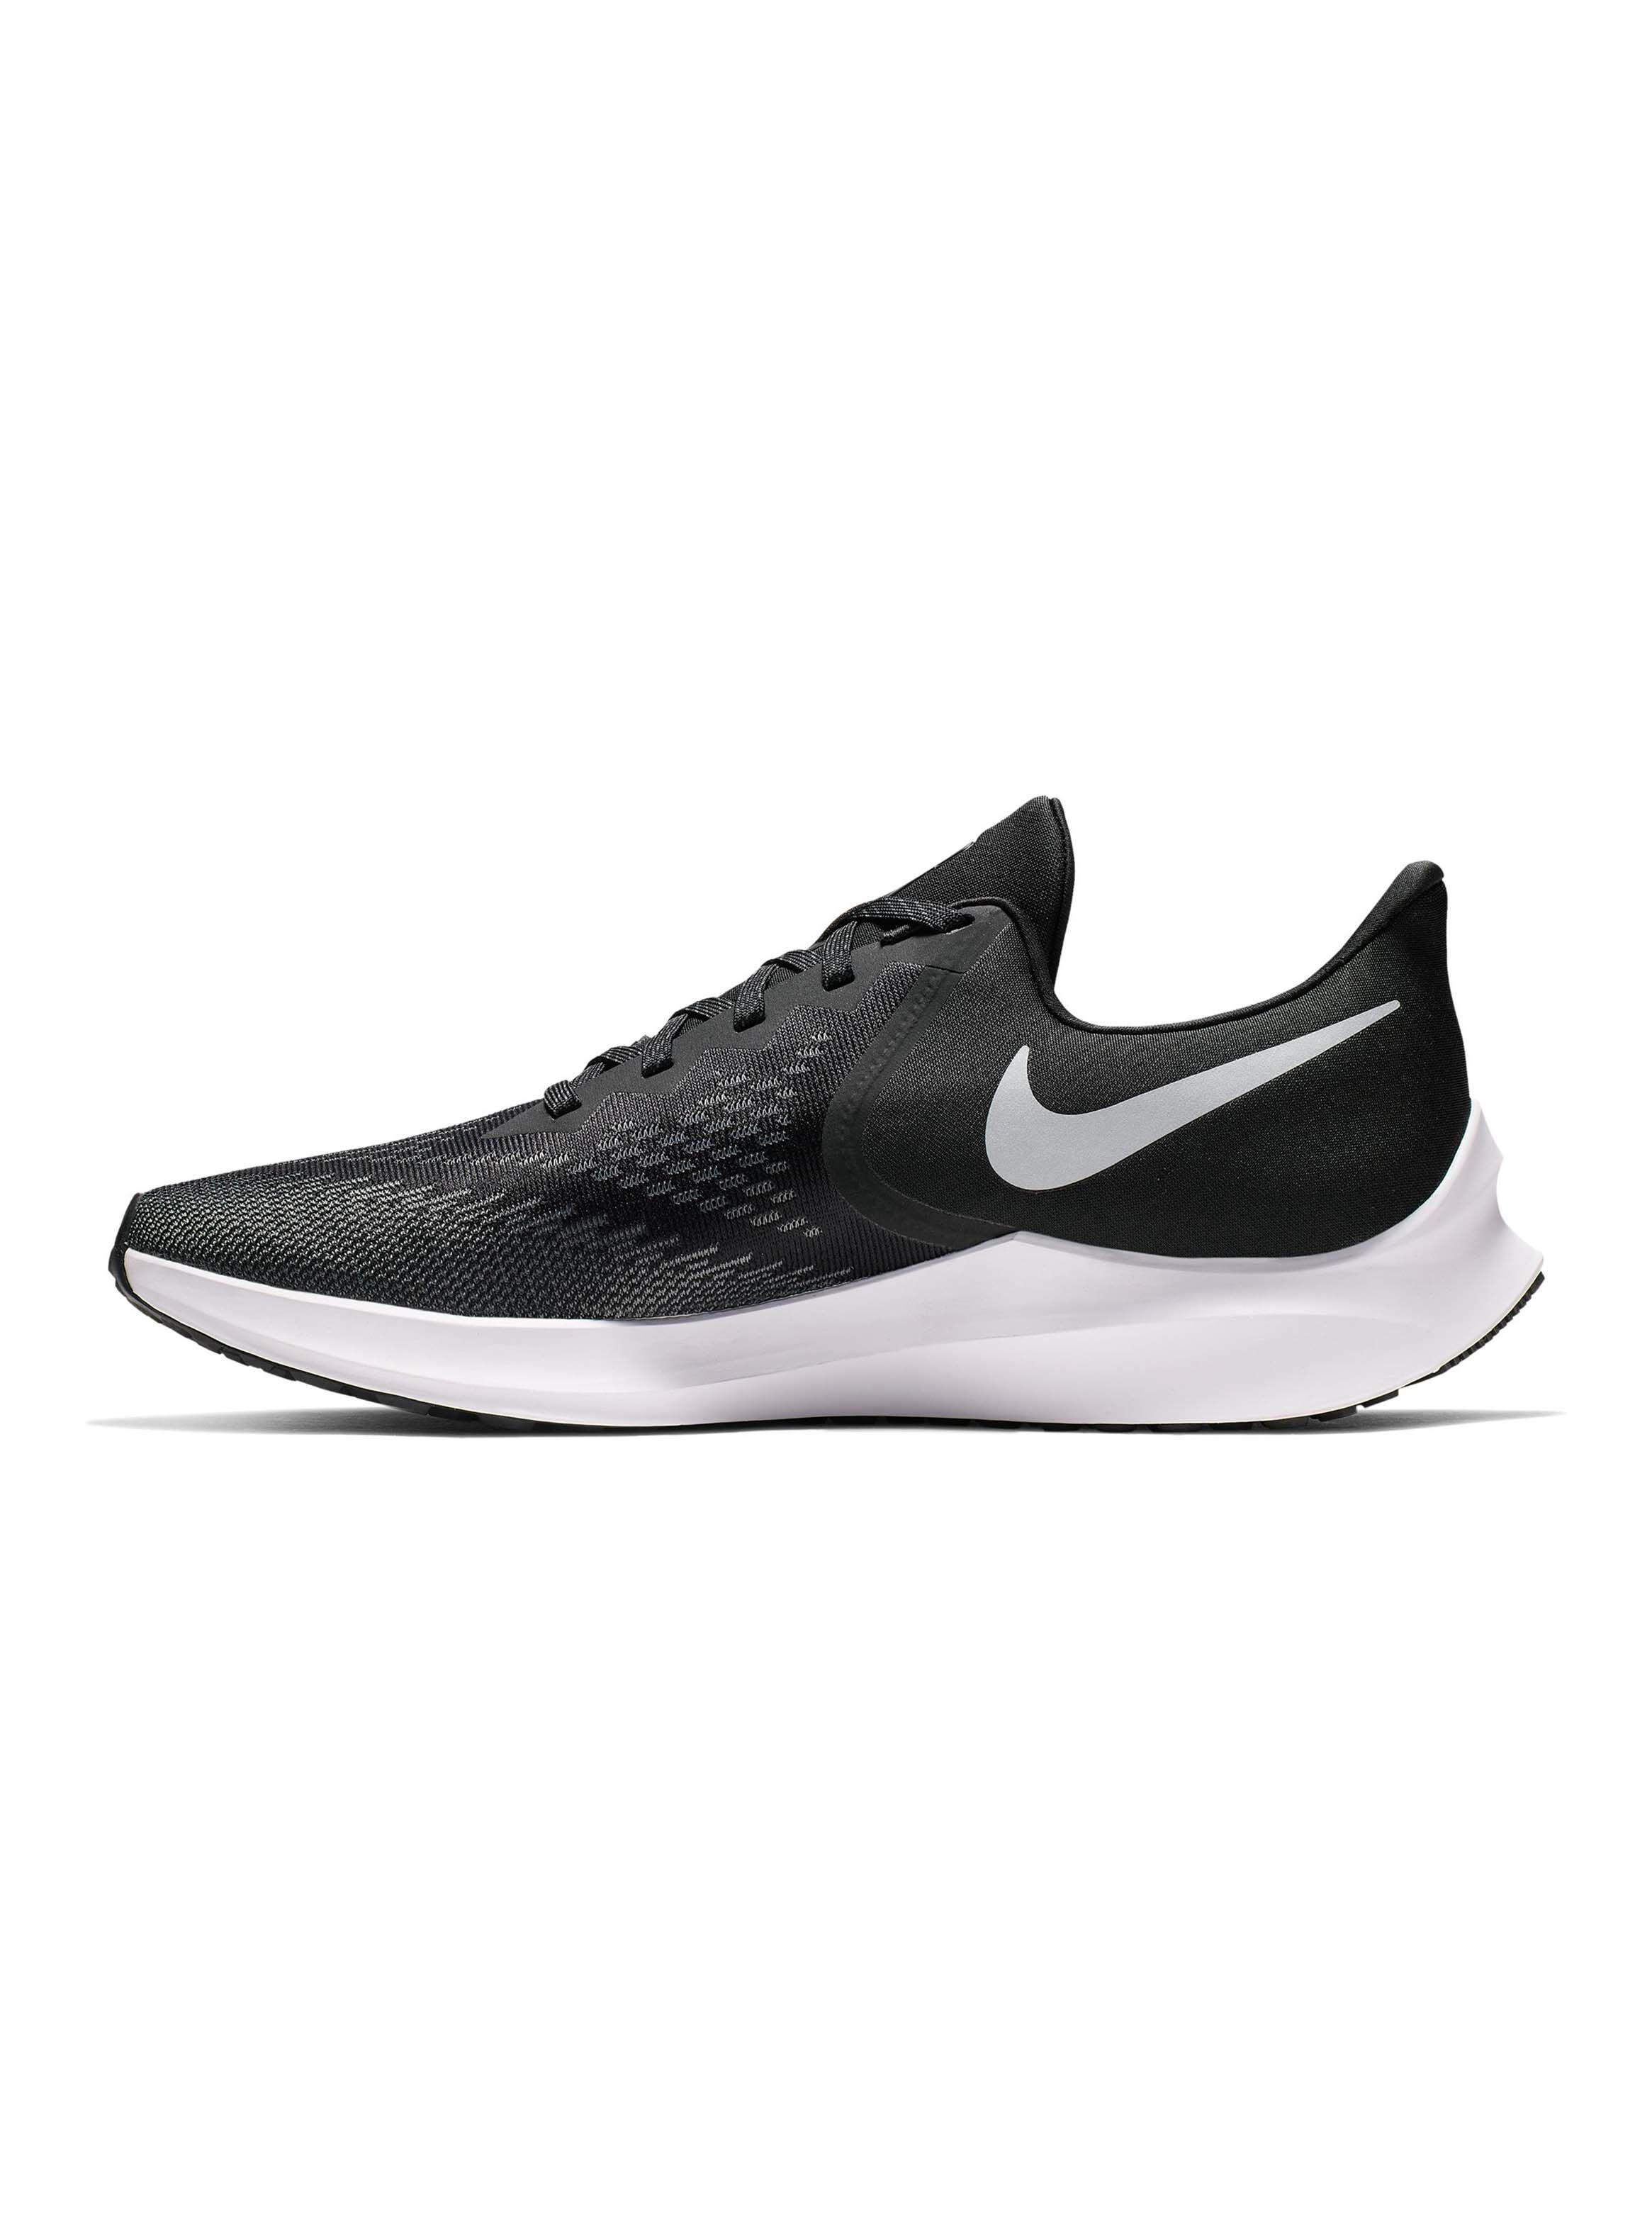 Calzado de skate : Nike Zoom Winflo 2 Hombre Running Shoes